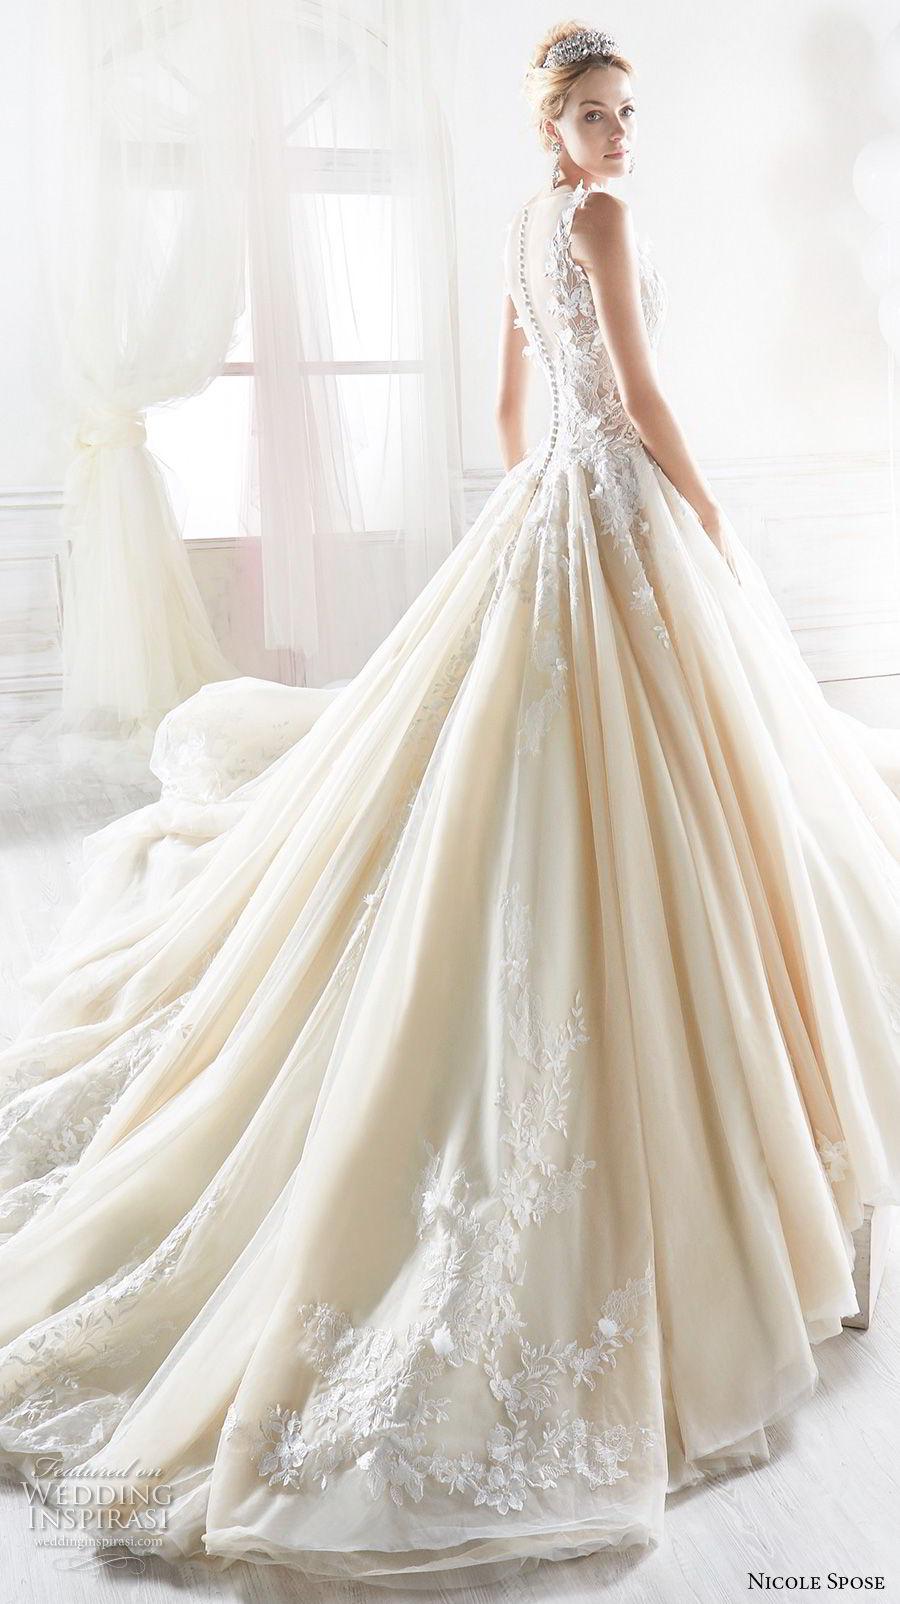 comprare on line ea6a4 f3819 Nicole 2018 Bridal Collection — Princess-Ready Wedding ...